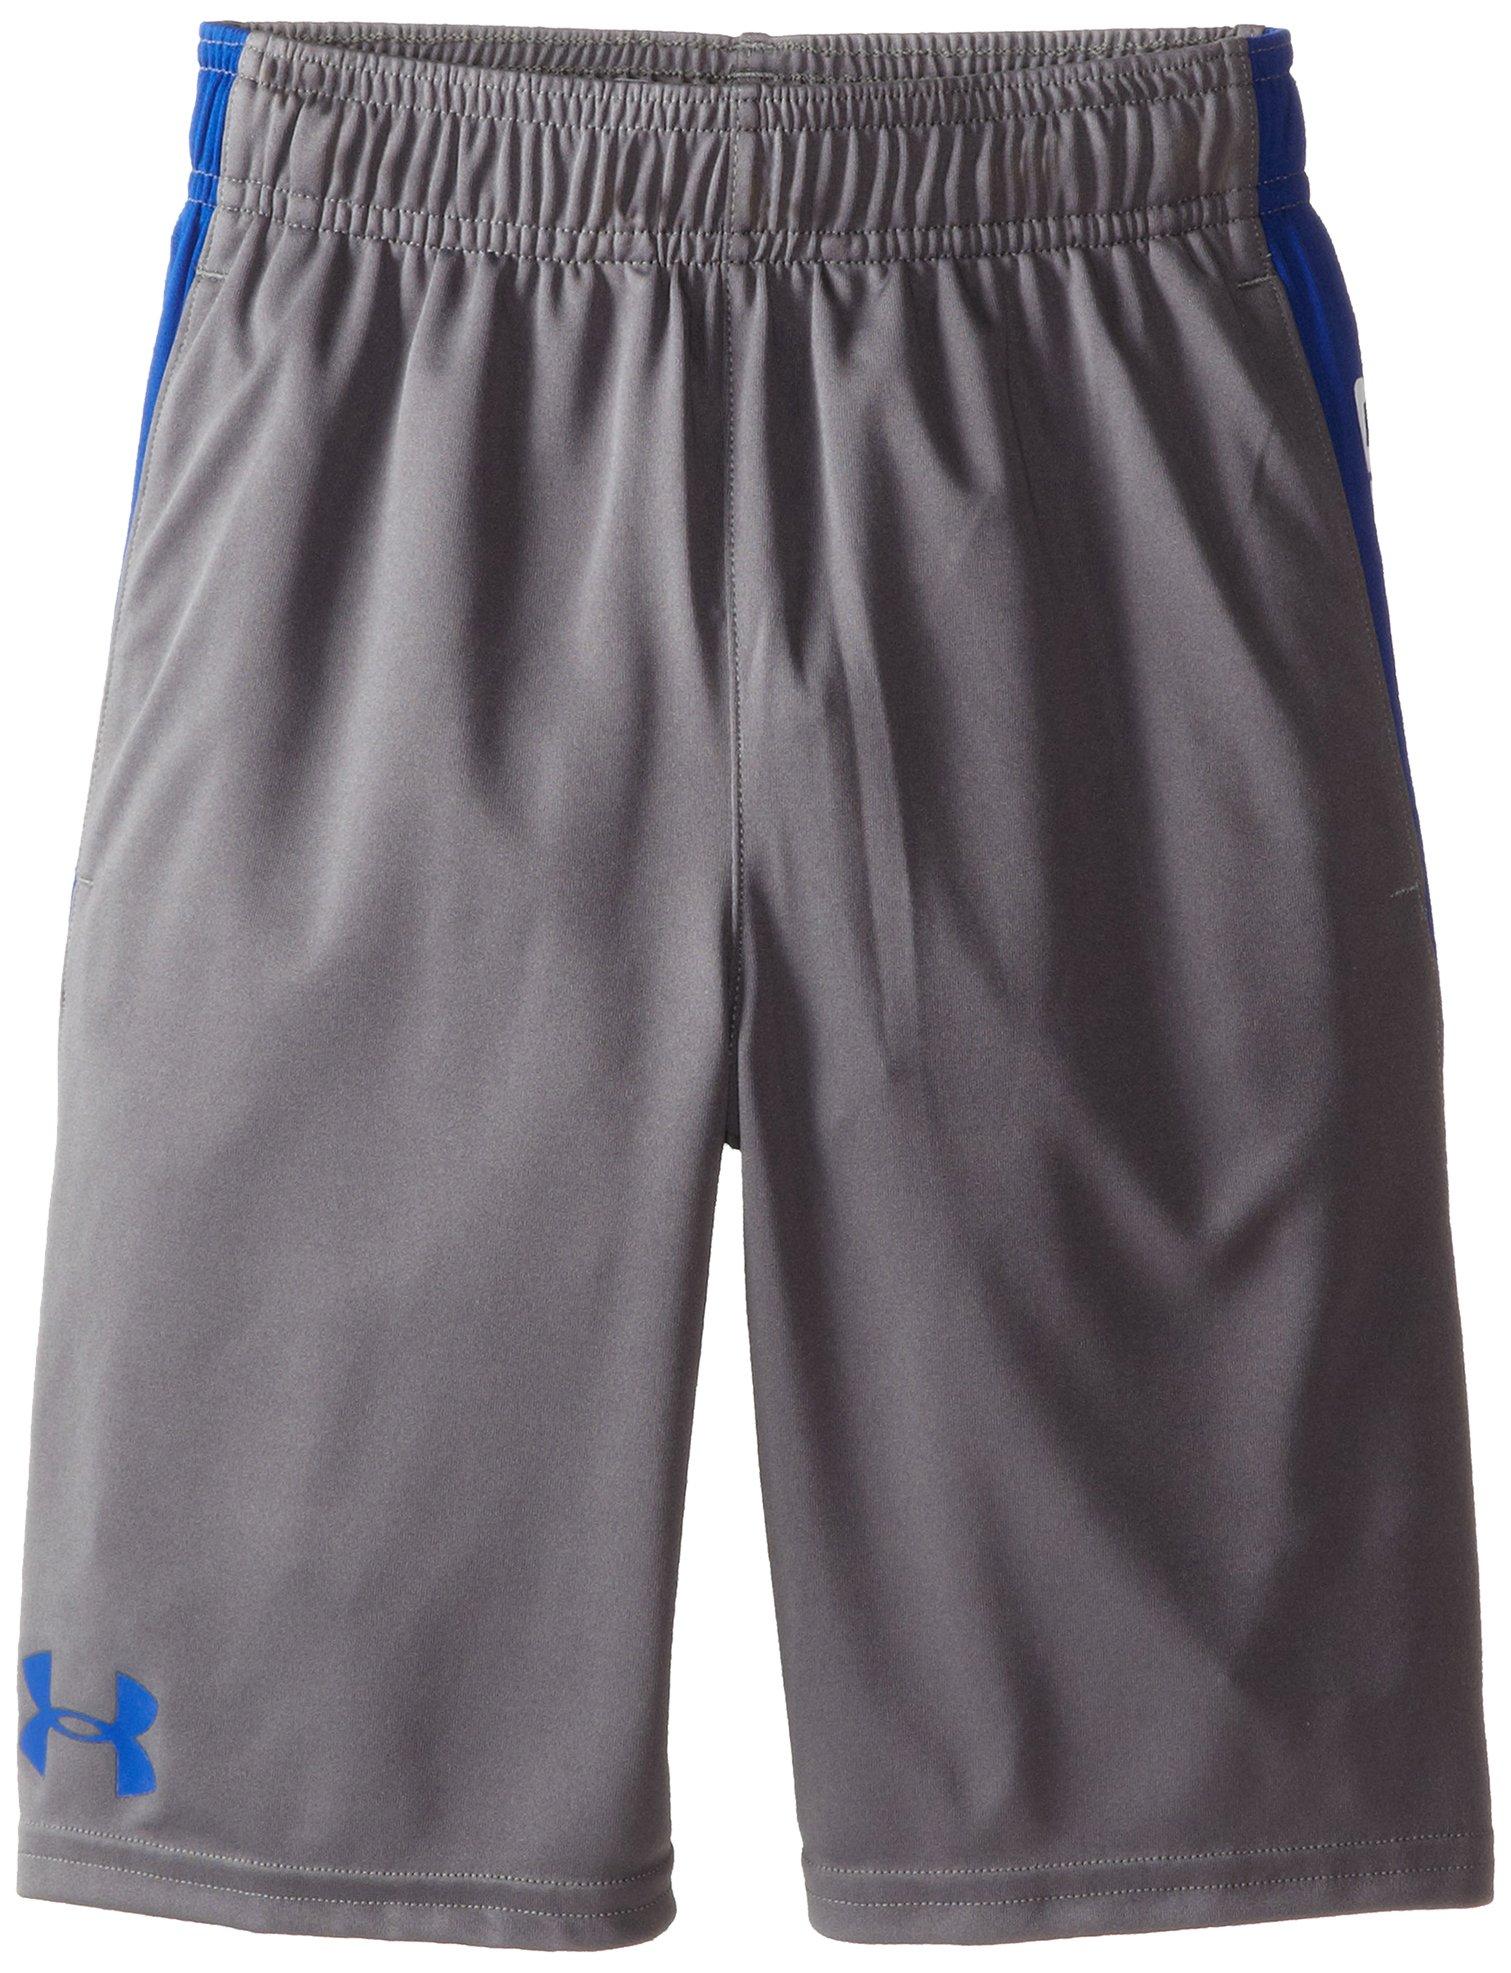 Under Armour Boy's Eliminator Shorts, Graphite